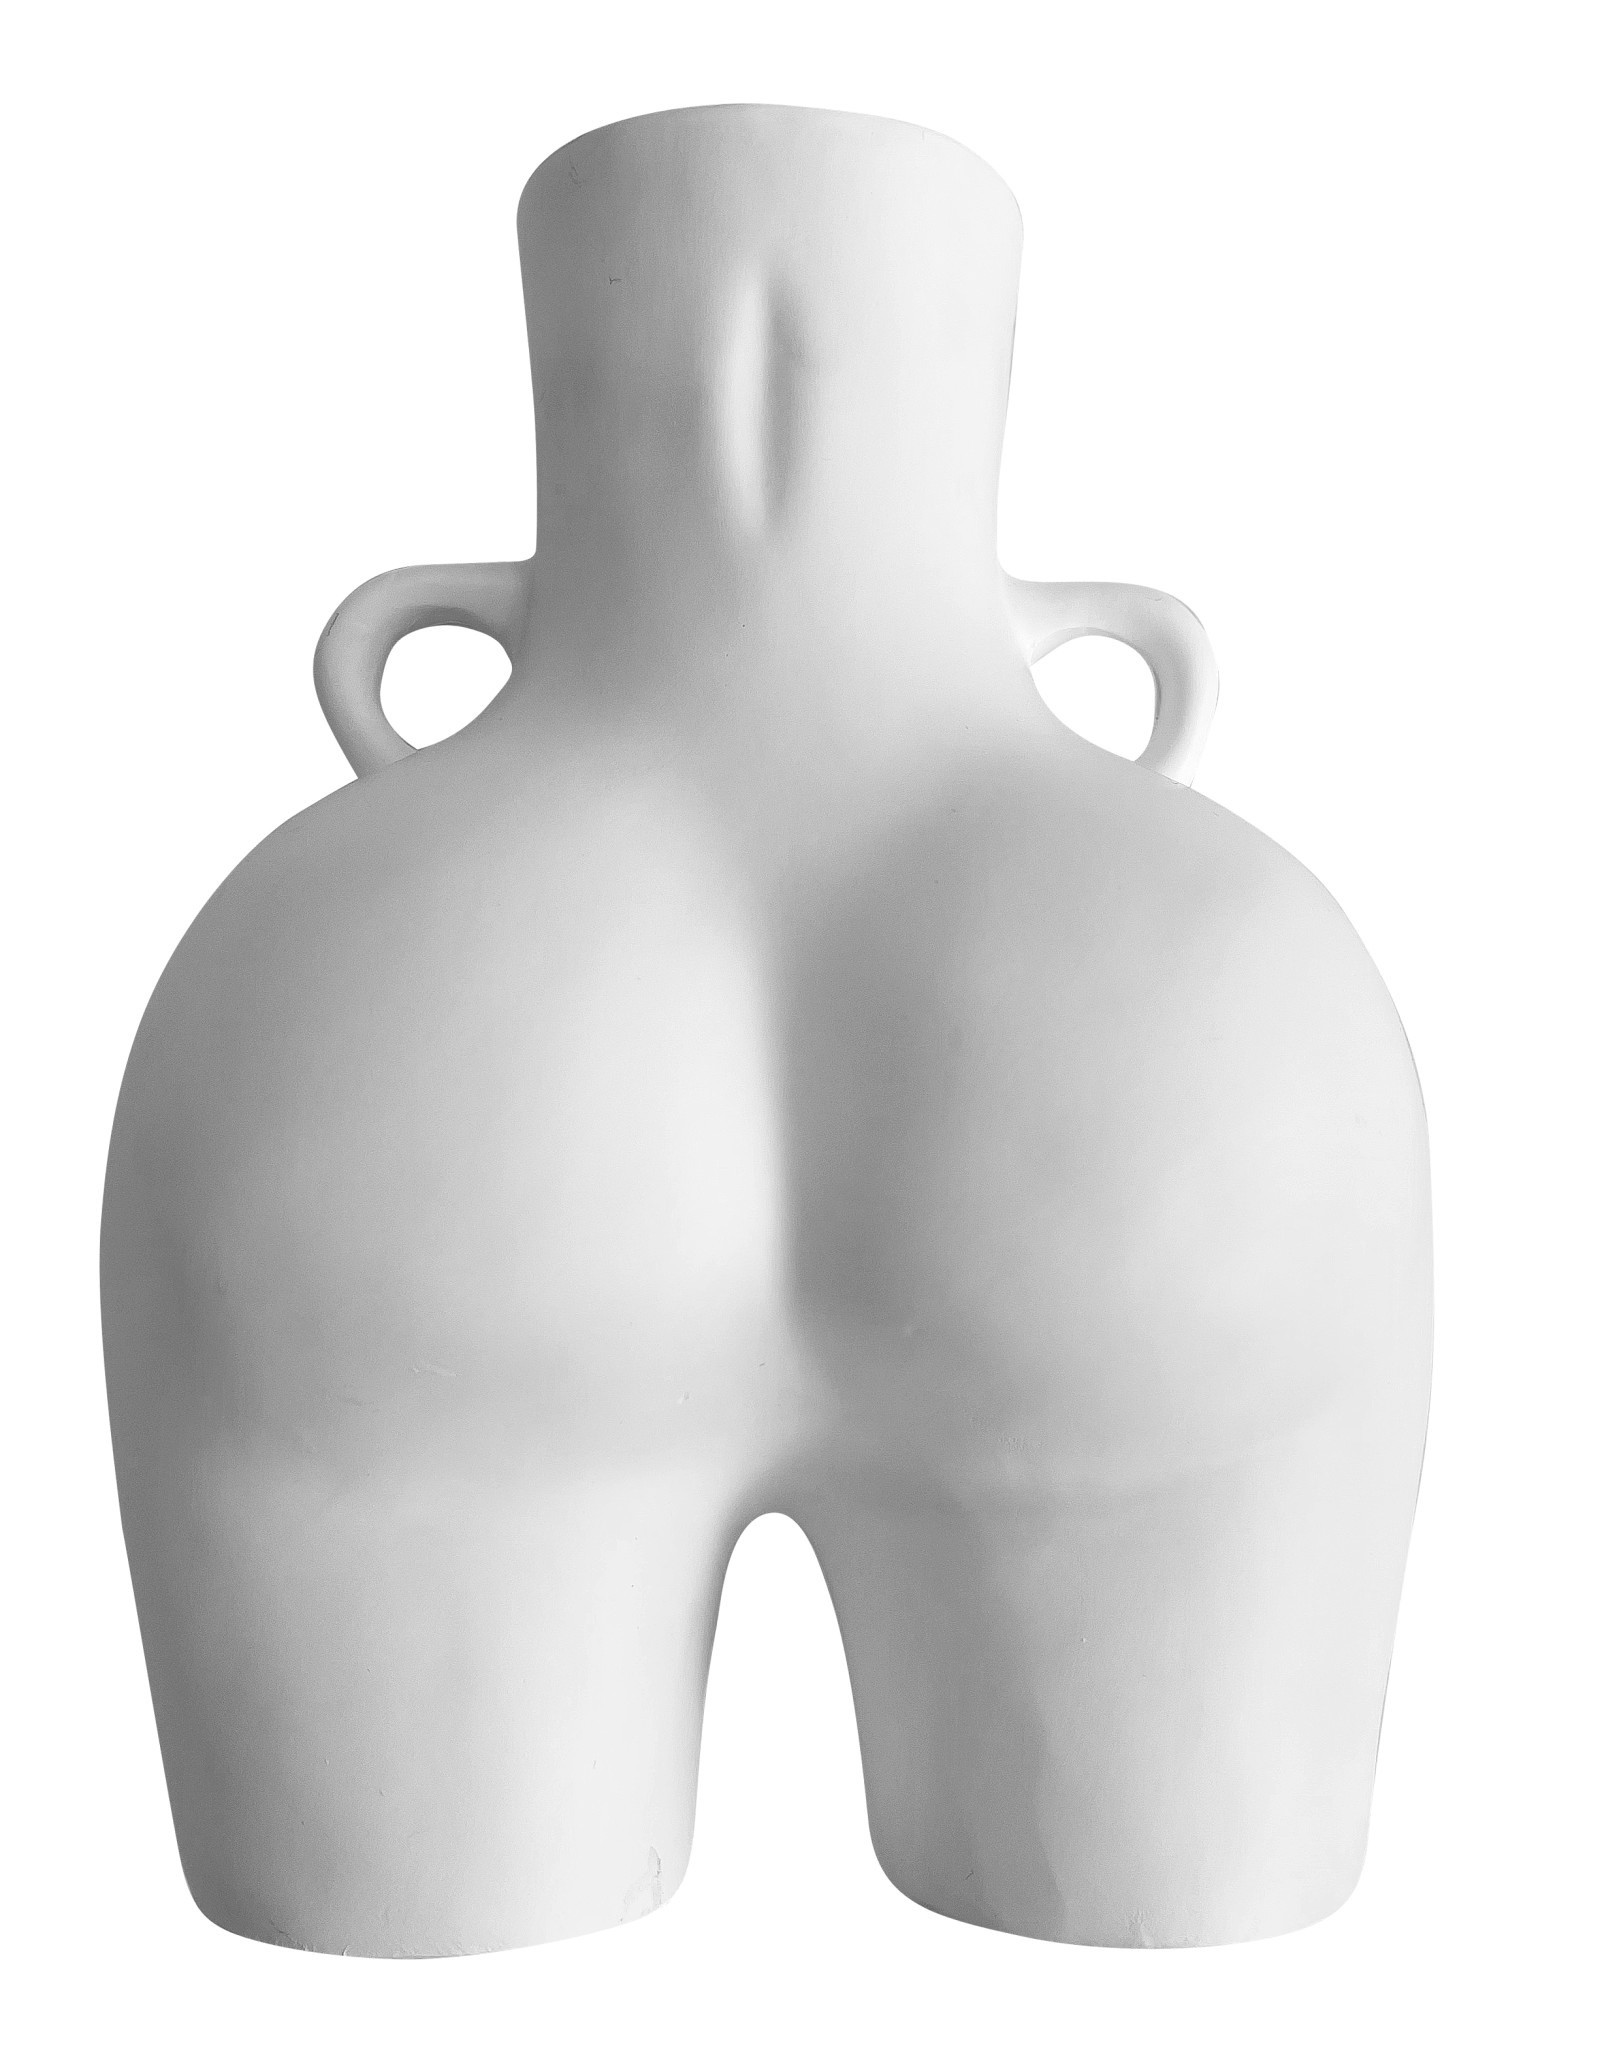 Wyld Blue Nude White Vase Hips